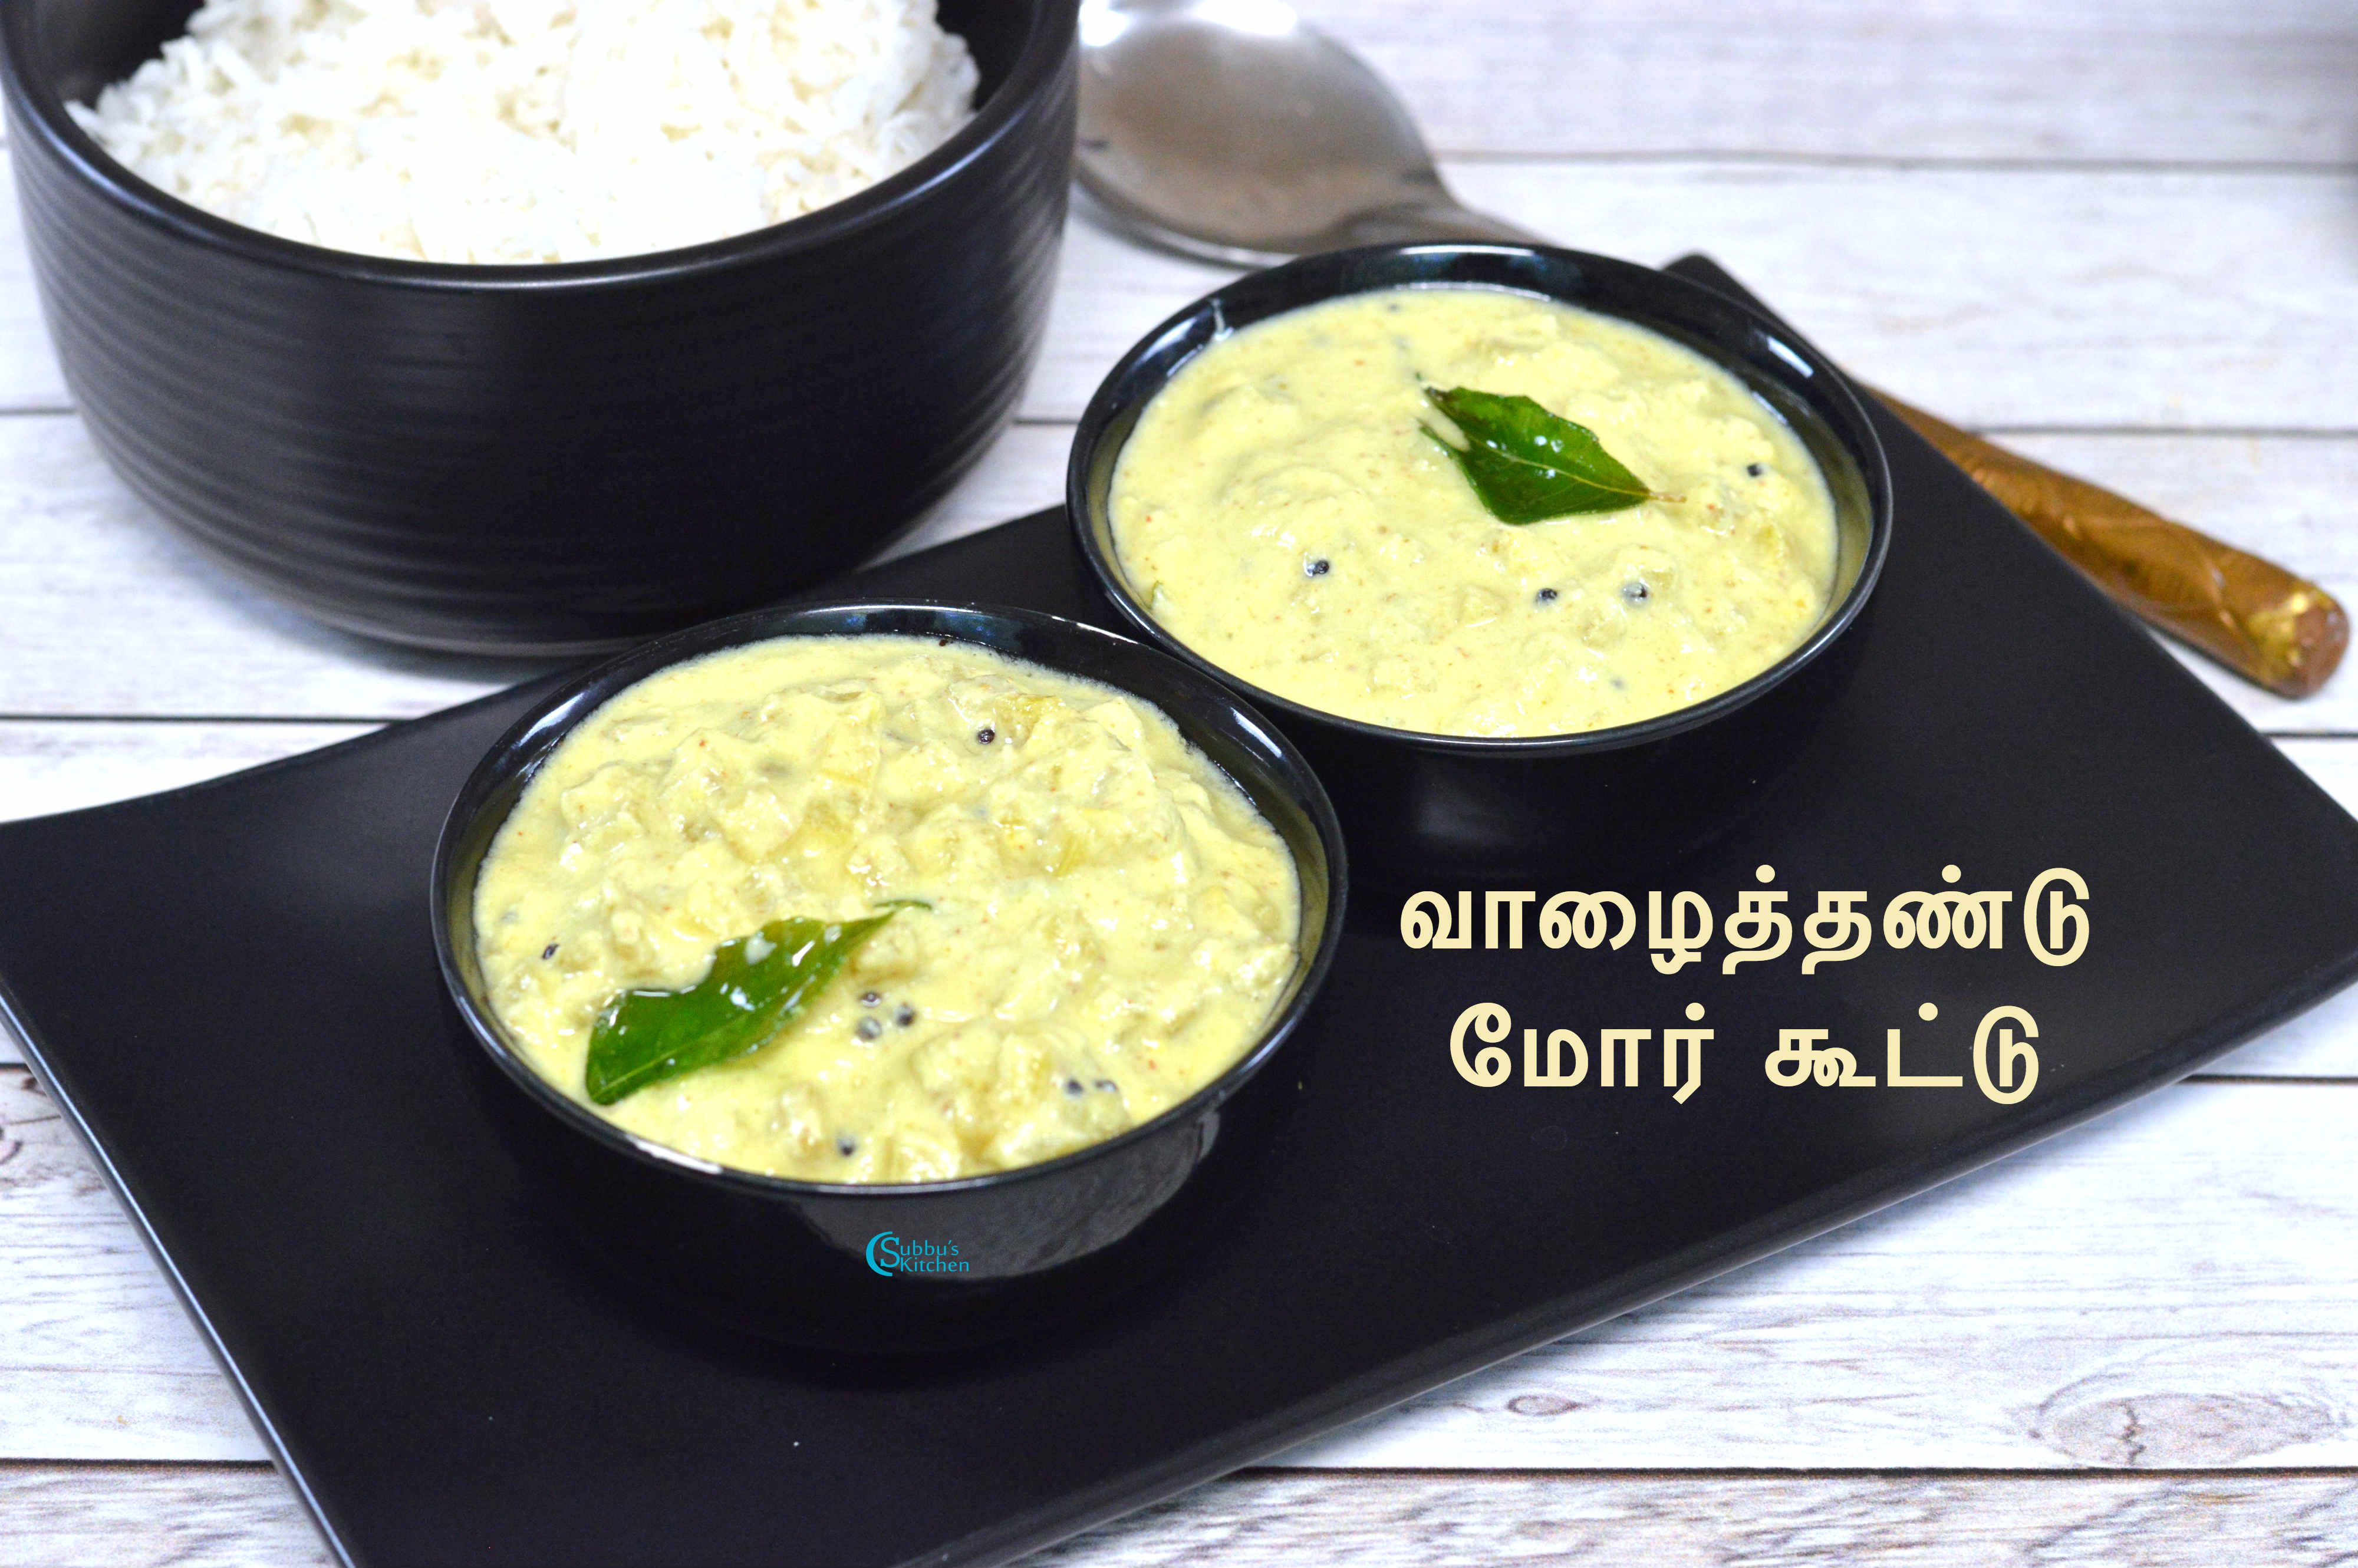 Vazhaithandu Mor Kootu Plantain Stem In Yogurt Sauce Subbus Kitchen Indian Side Dishes Cooking Yogurt Sauce